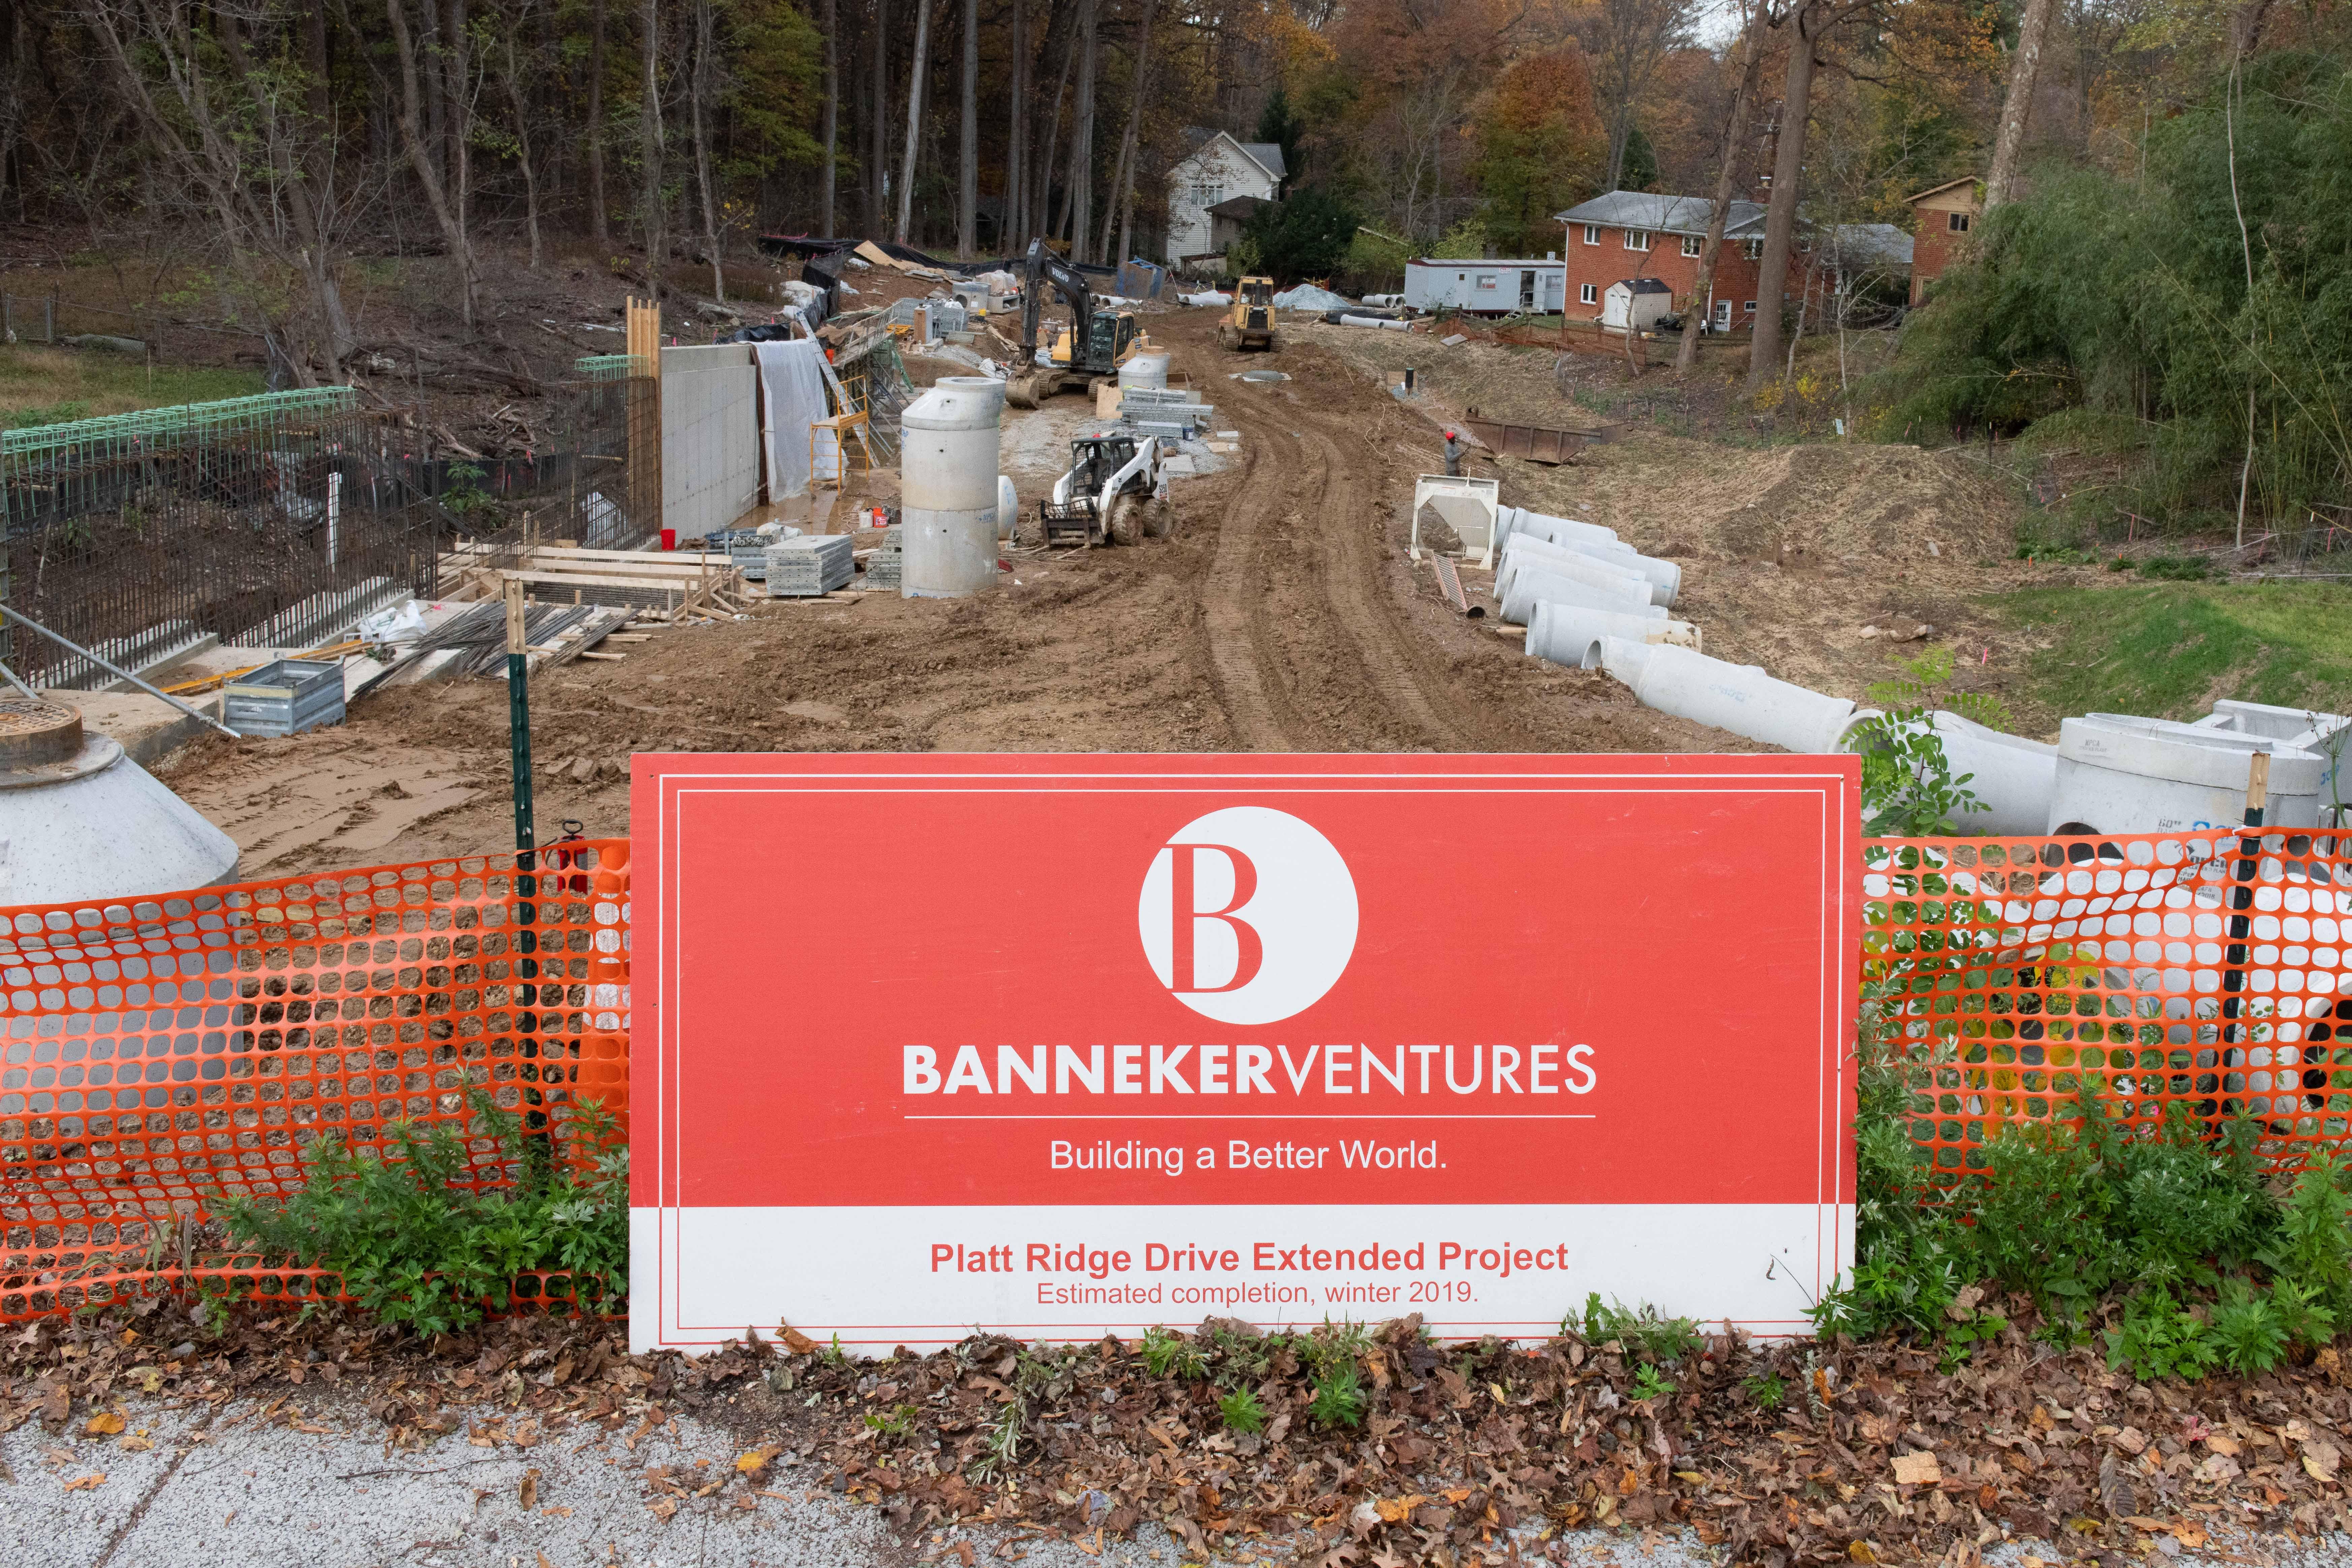 Montgomery County Platt Ridge Drive Extended